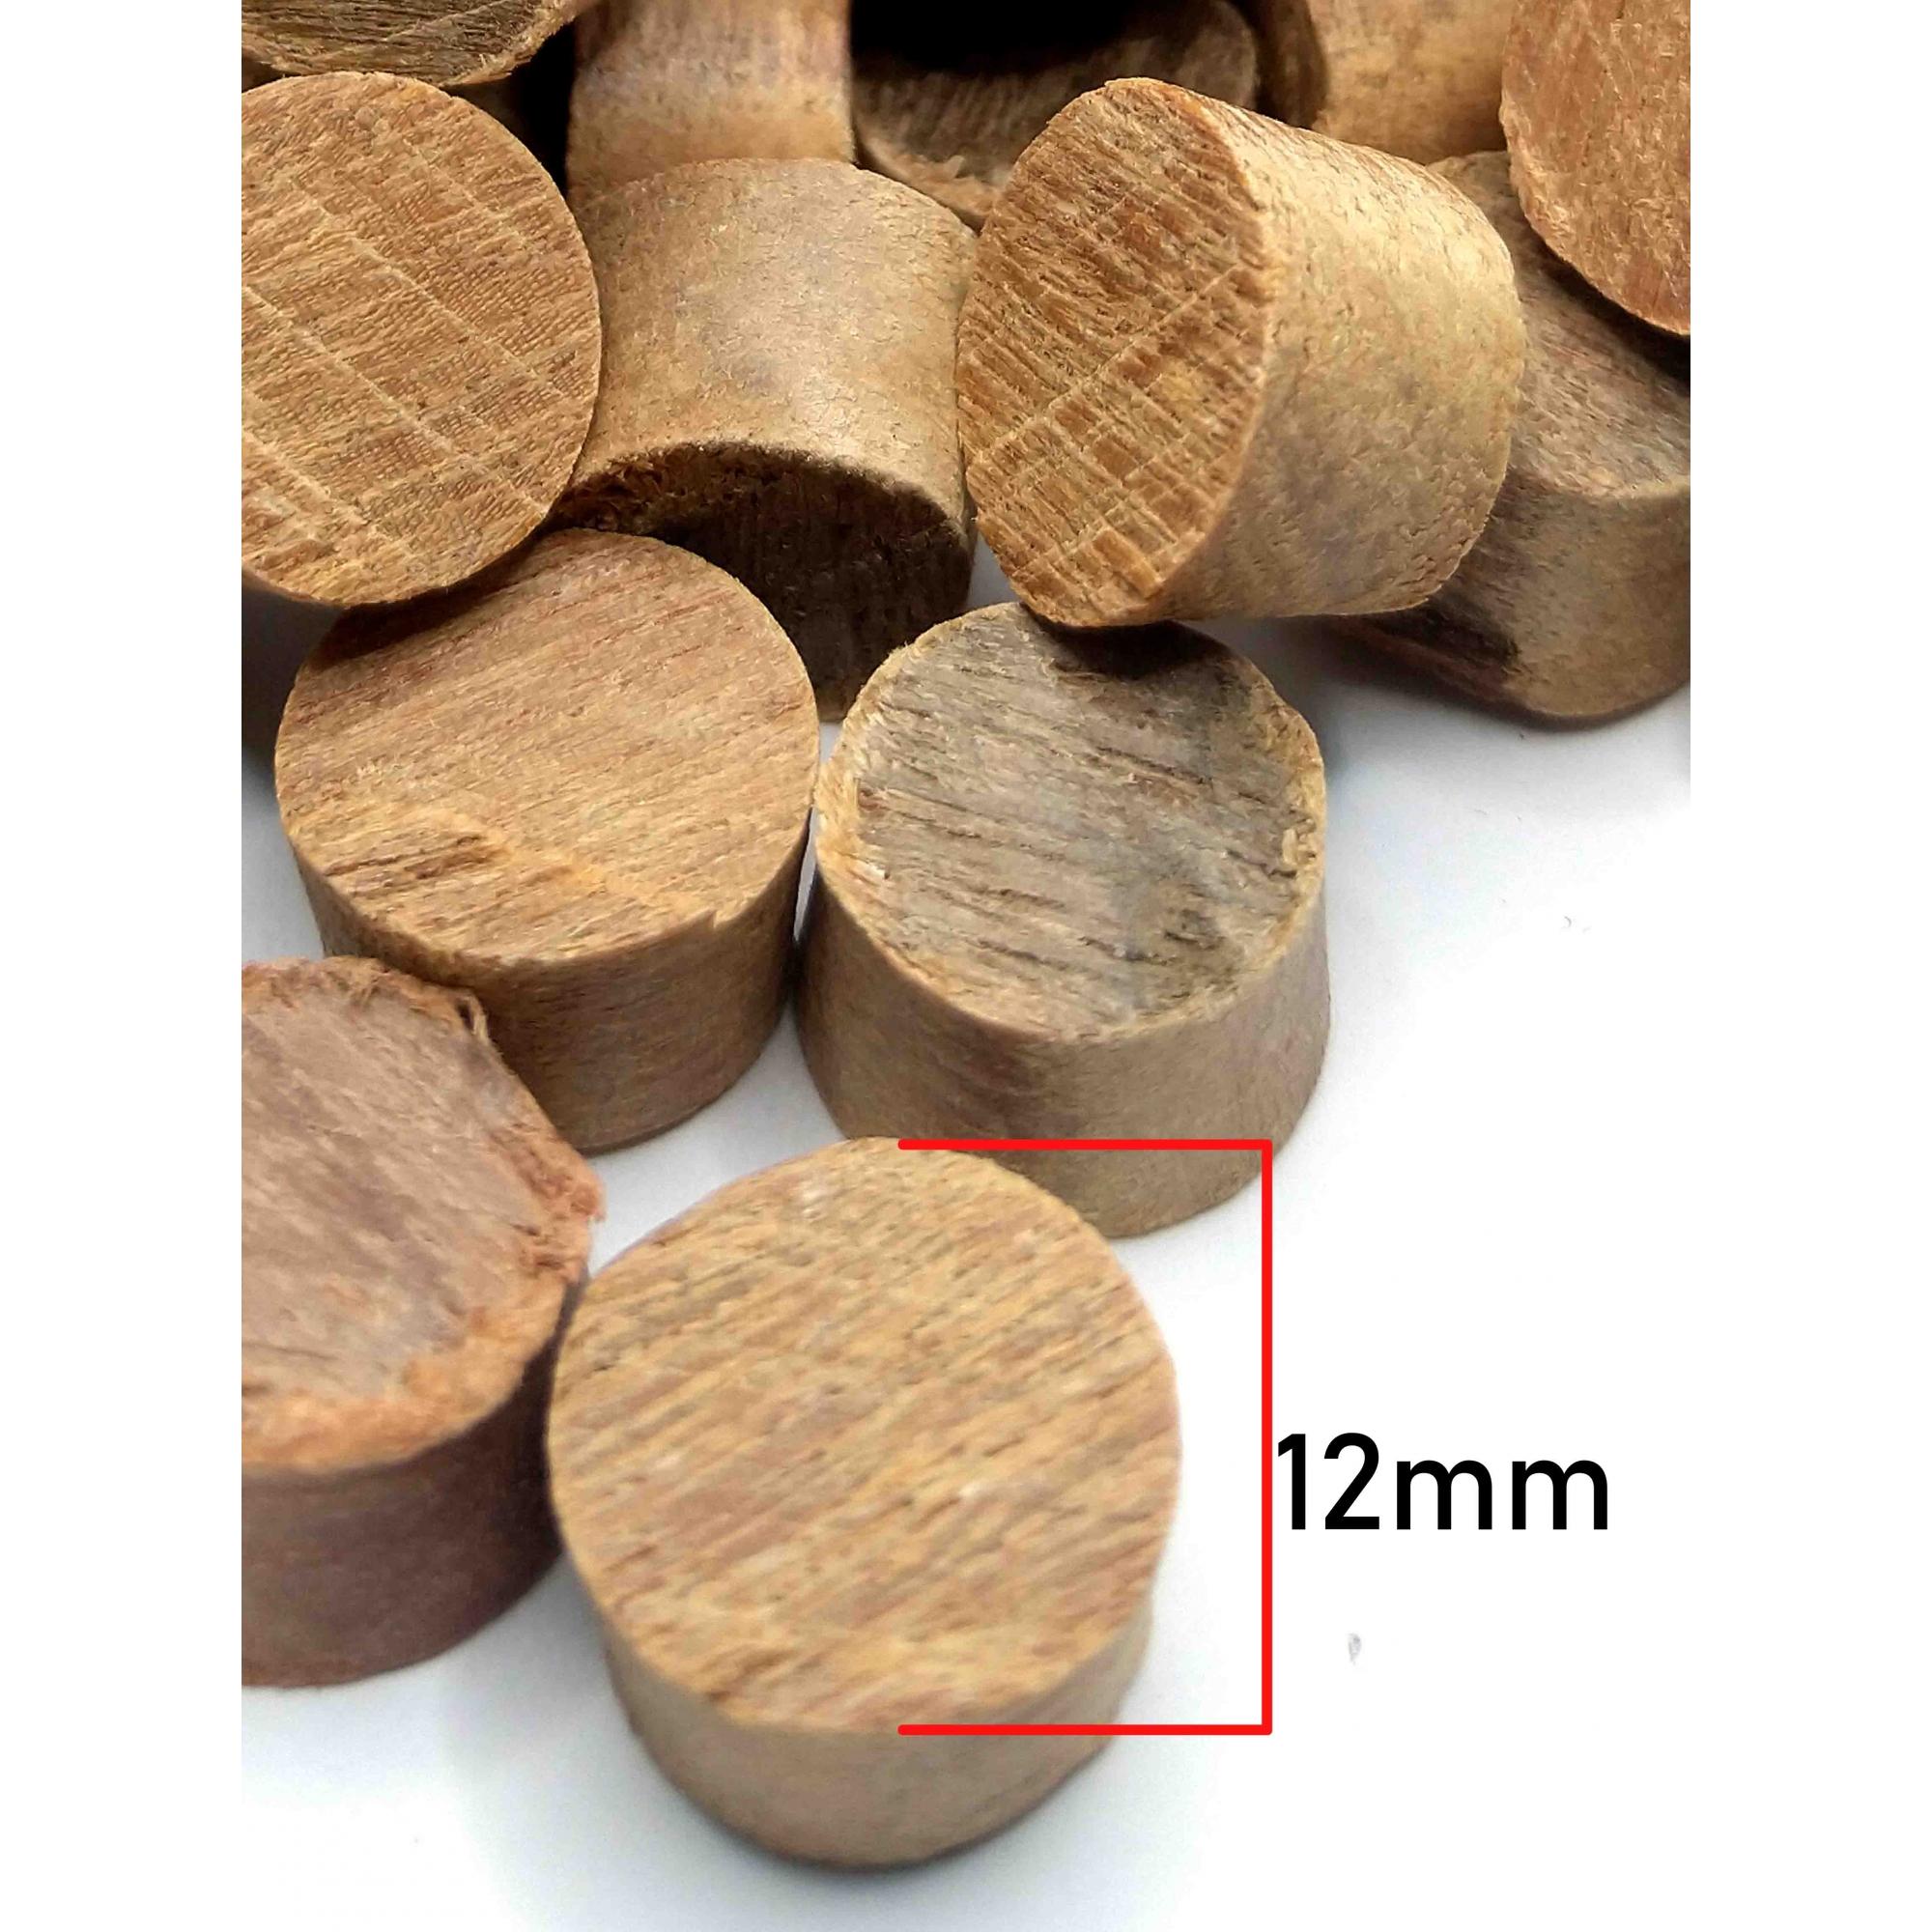 Cavilha assoalho cônica cumarú 12 mm -100 pcs